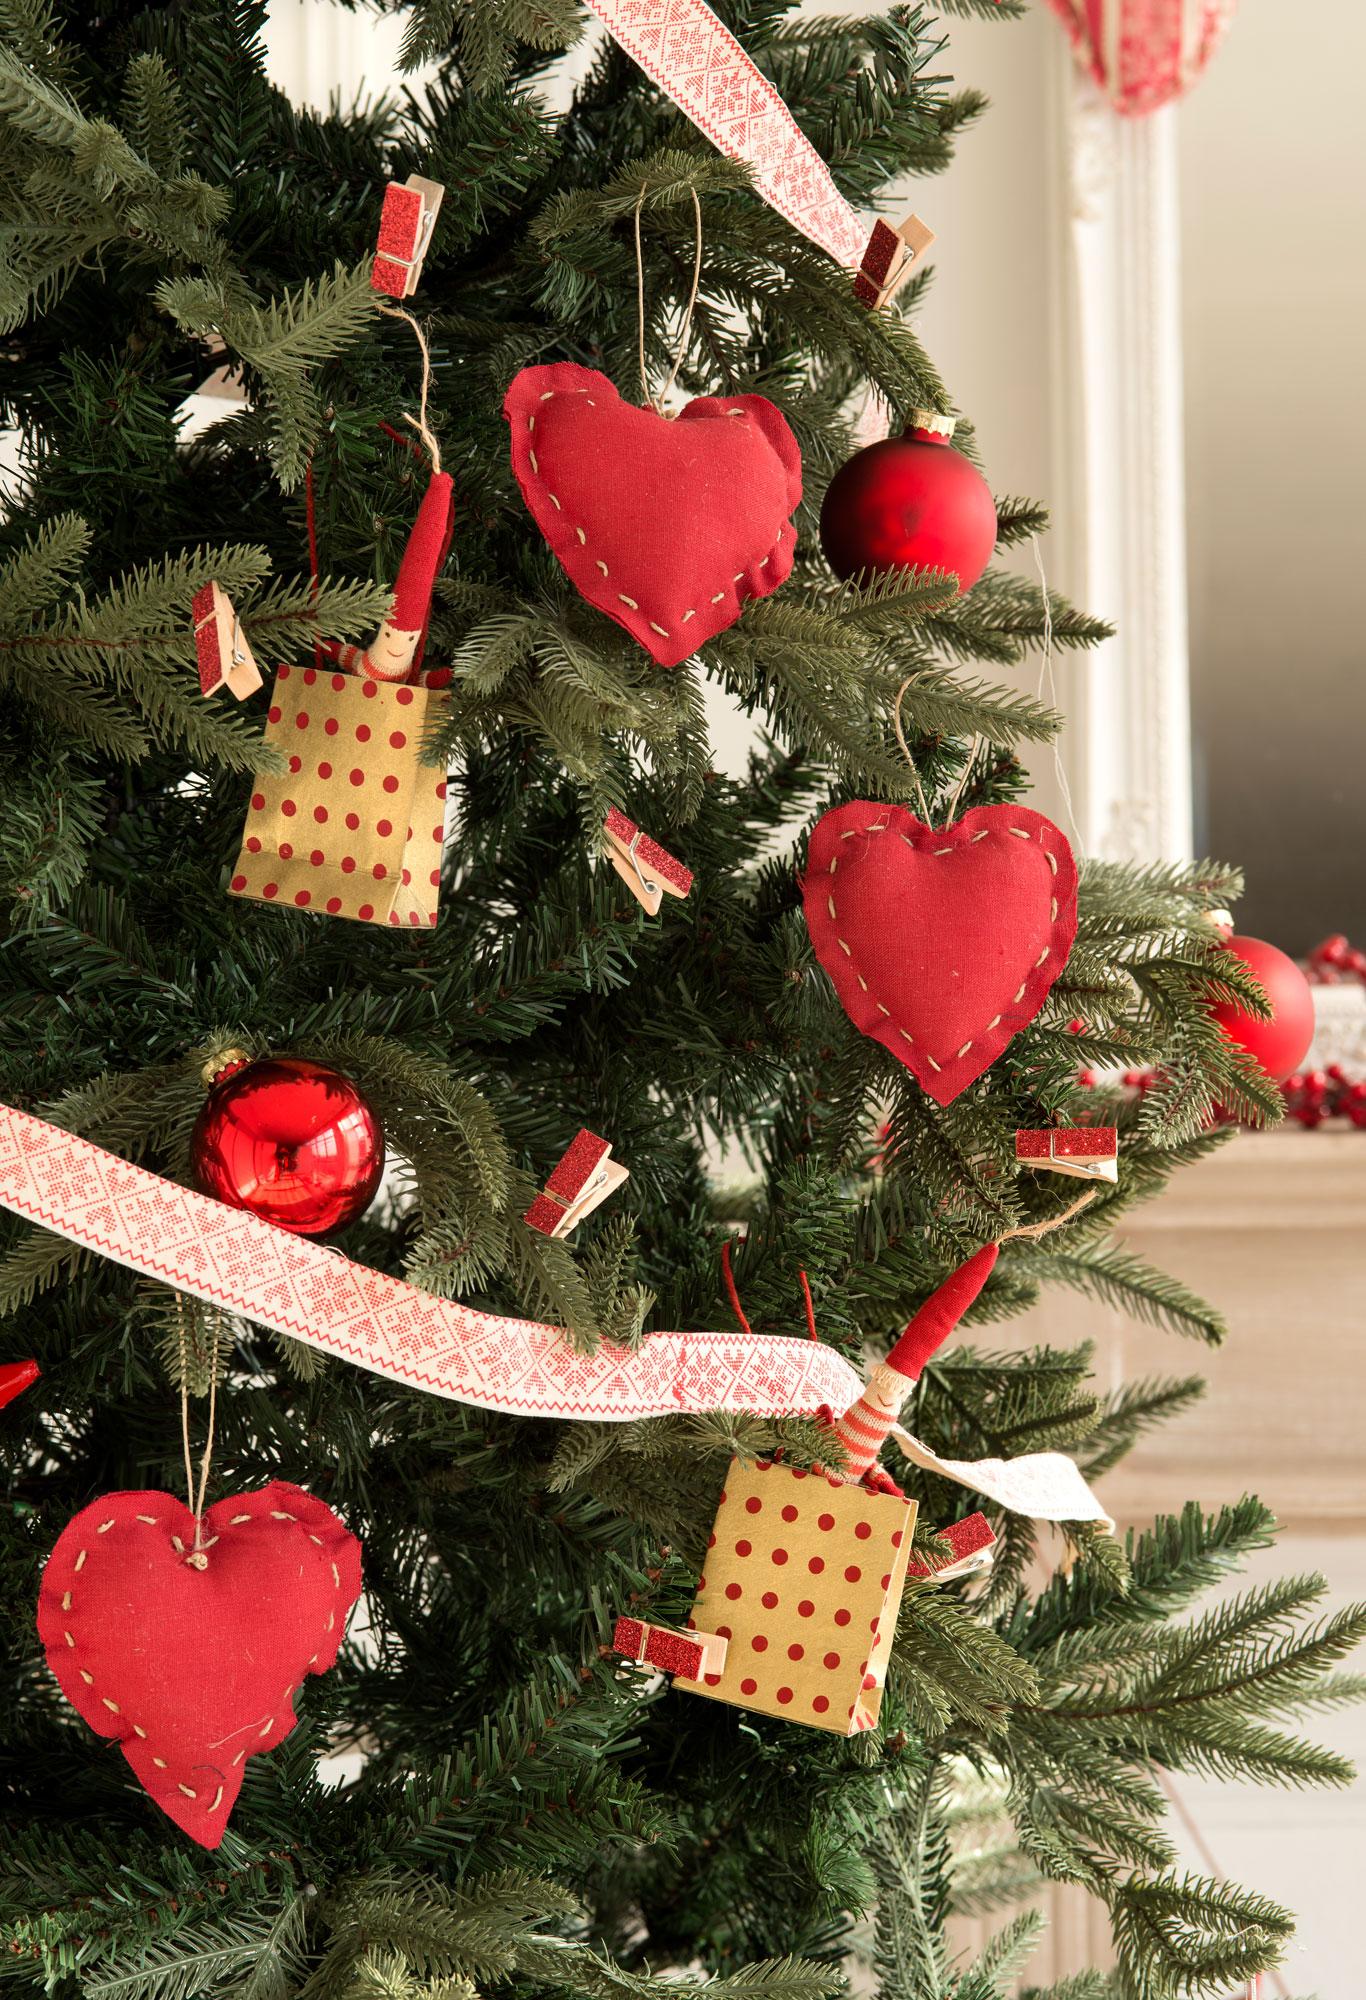 Decoraci n de navidad qu desastres evitar - Detalles de decoracion para casa ...